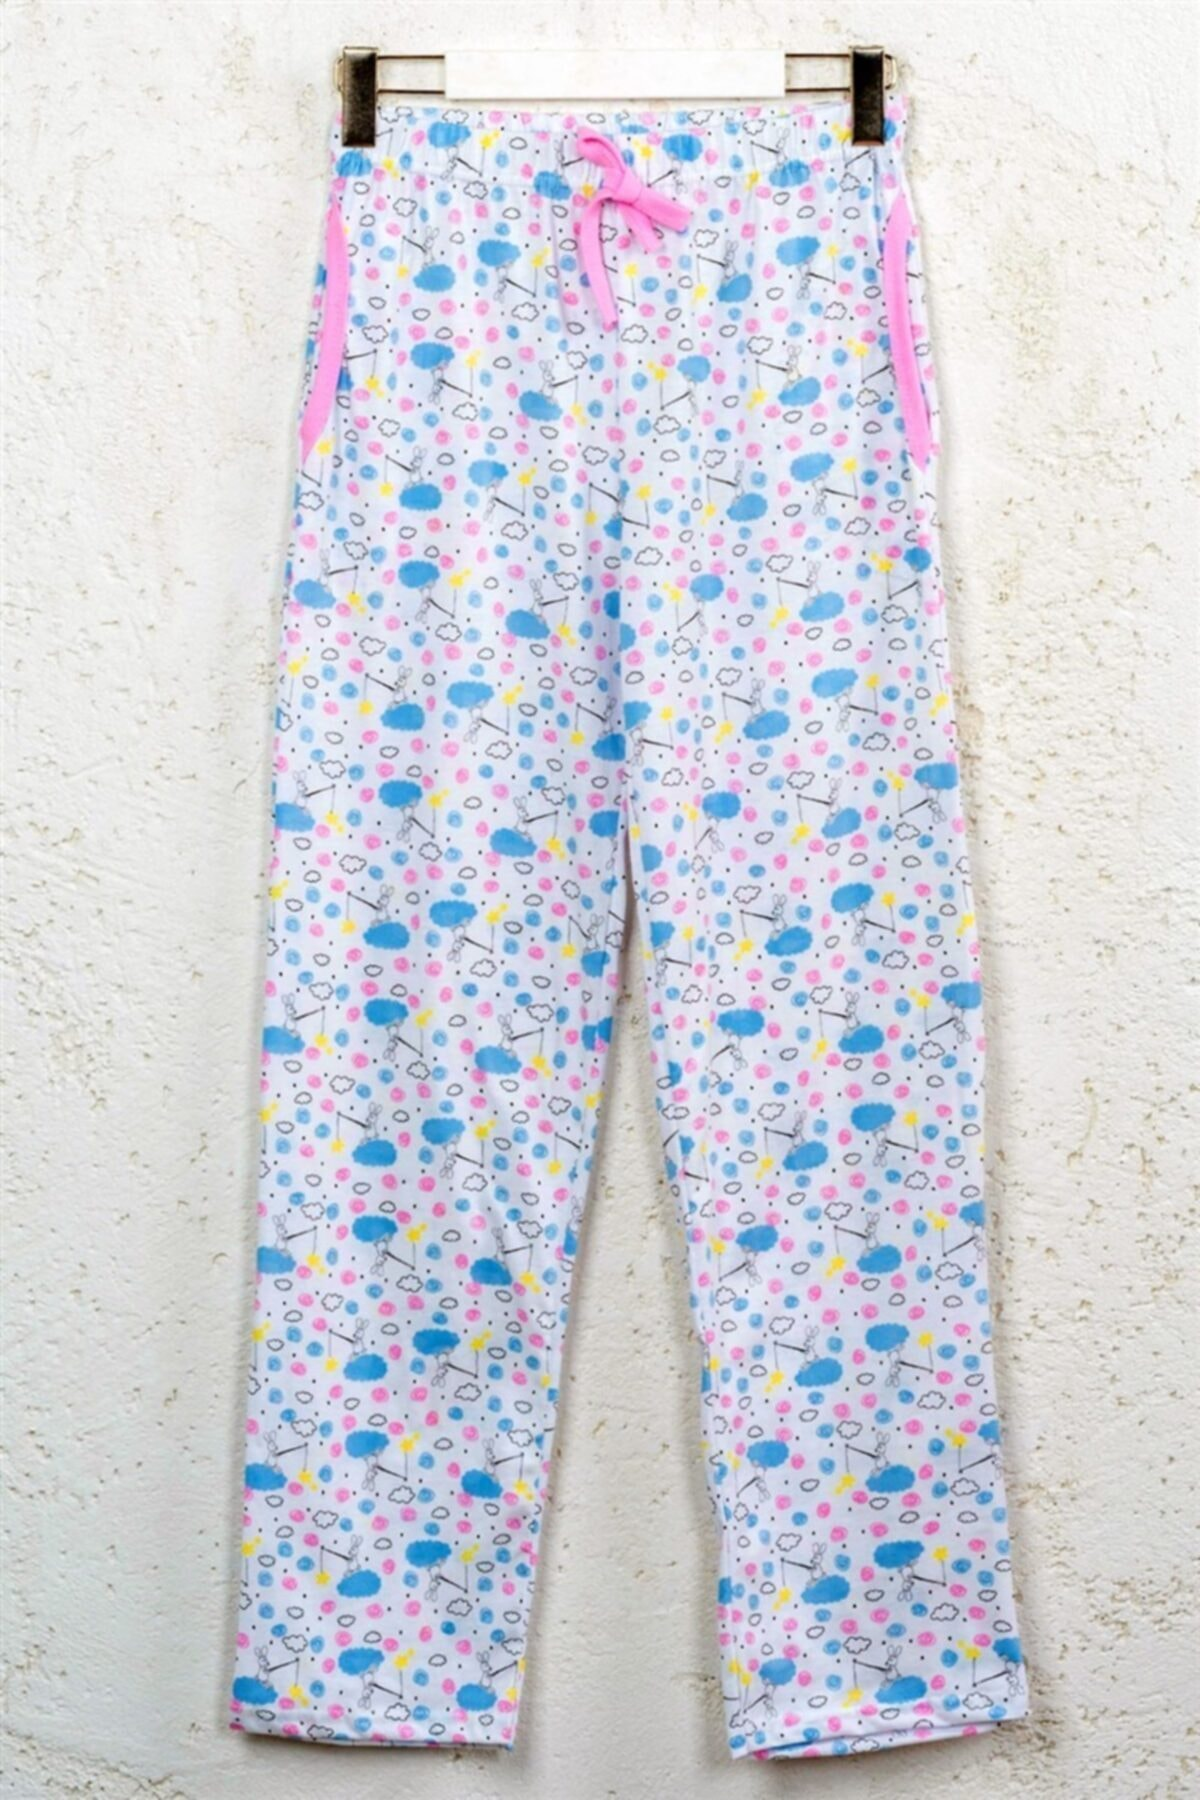 Kadın Pamuklu Beyaz Desenli Cepli Ev Giyim Rahat Pijama Altı